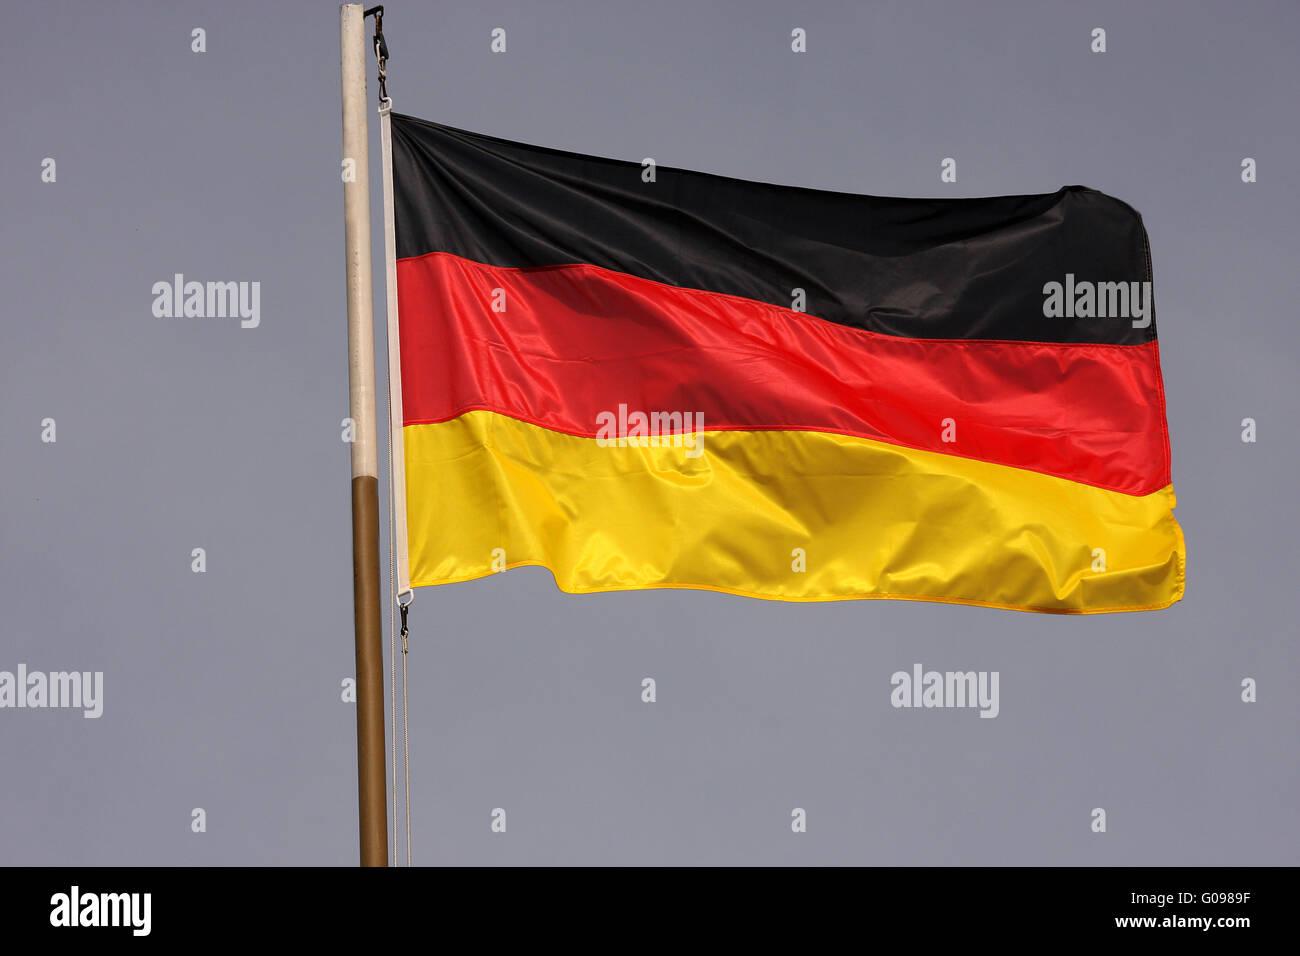 flag - Stock Image